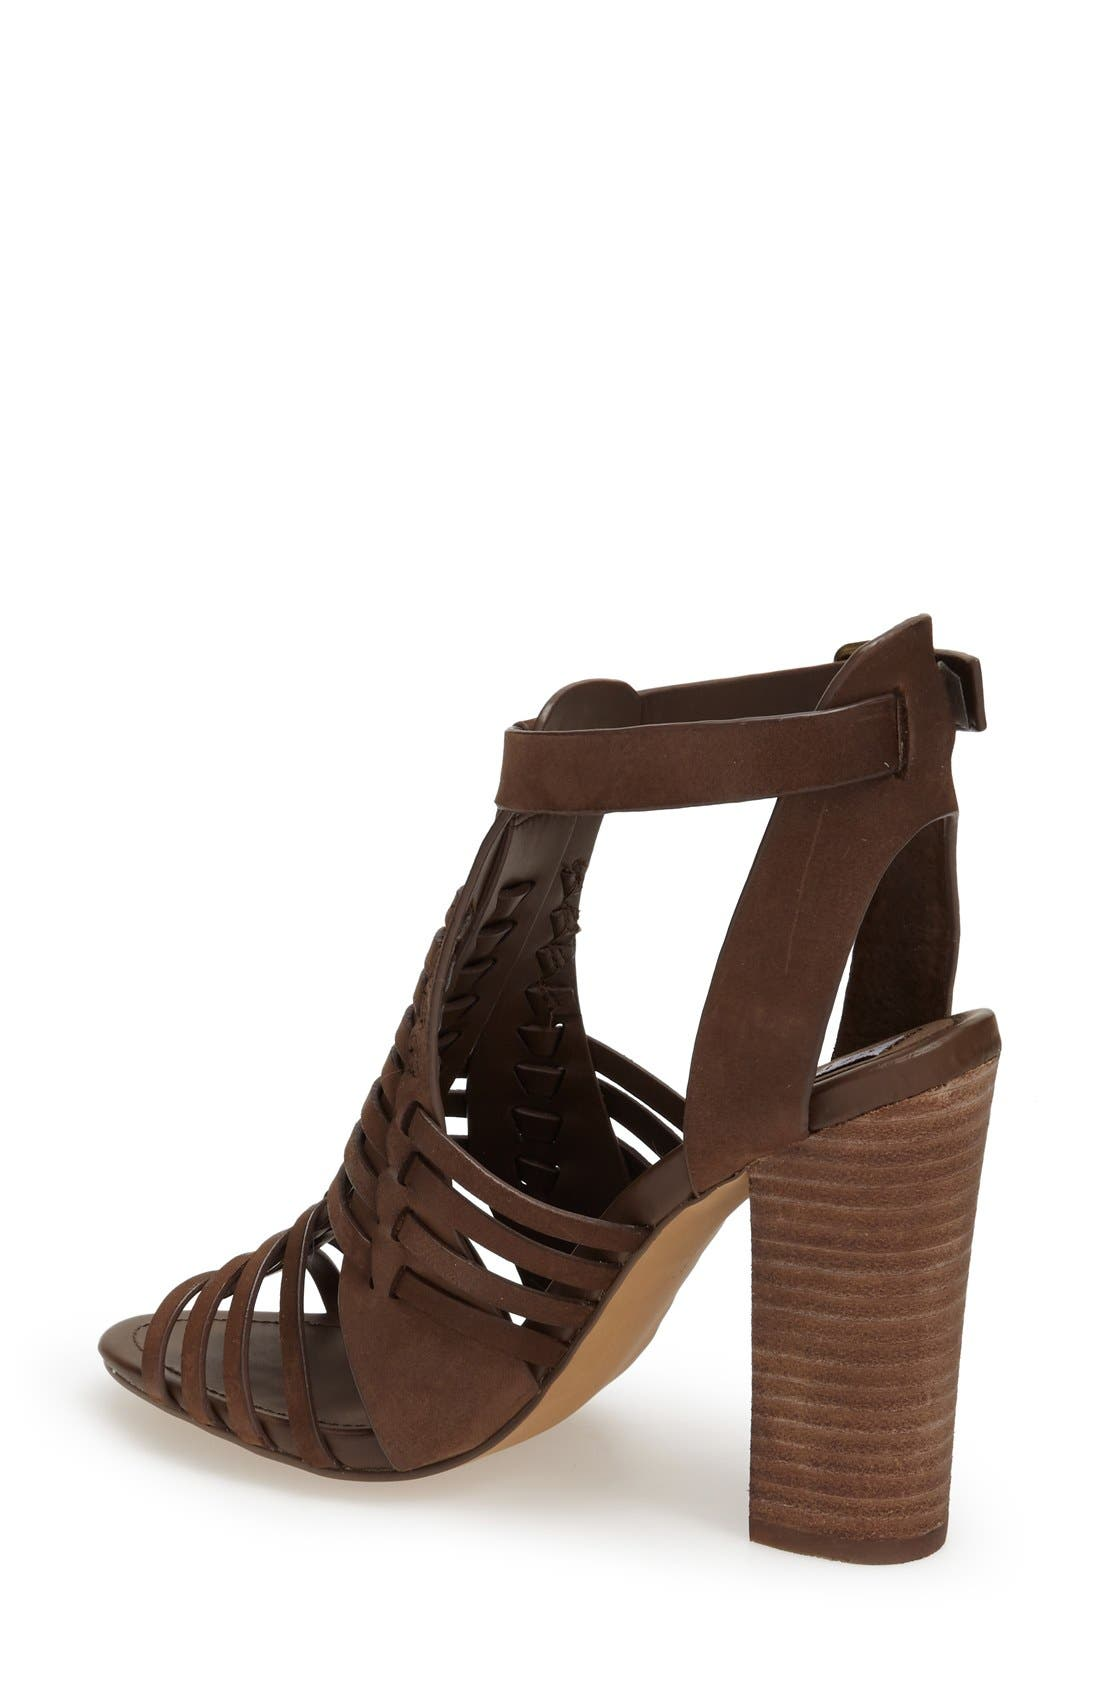 'Sandrina' Huarache Sandal,                             Alternate thumbnail 2, color,                             Brown Leather